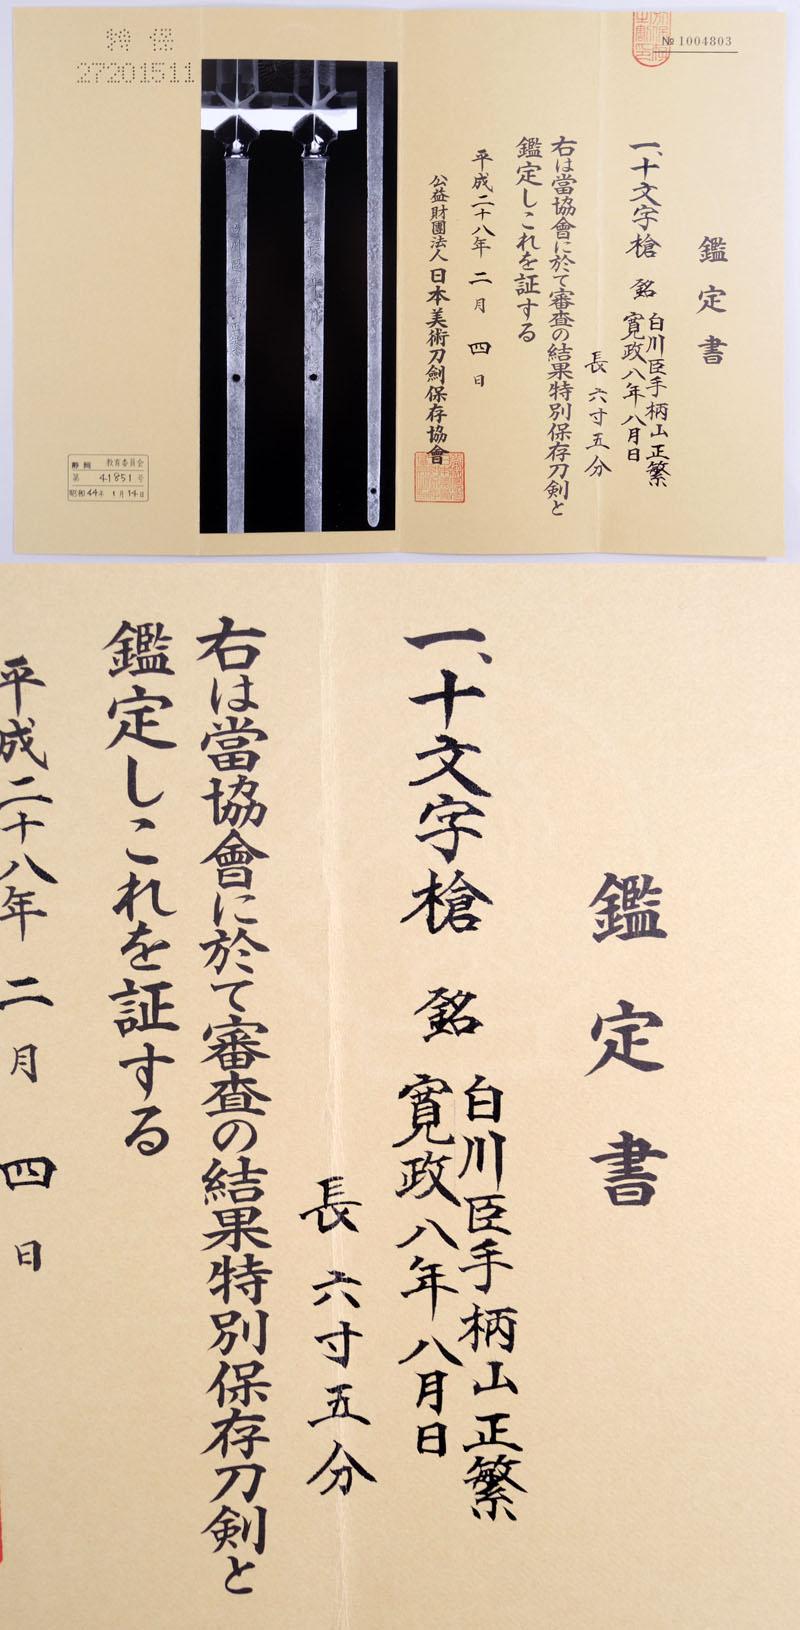 白川臣手柄山正繁 Picture of Certificate